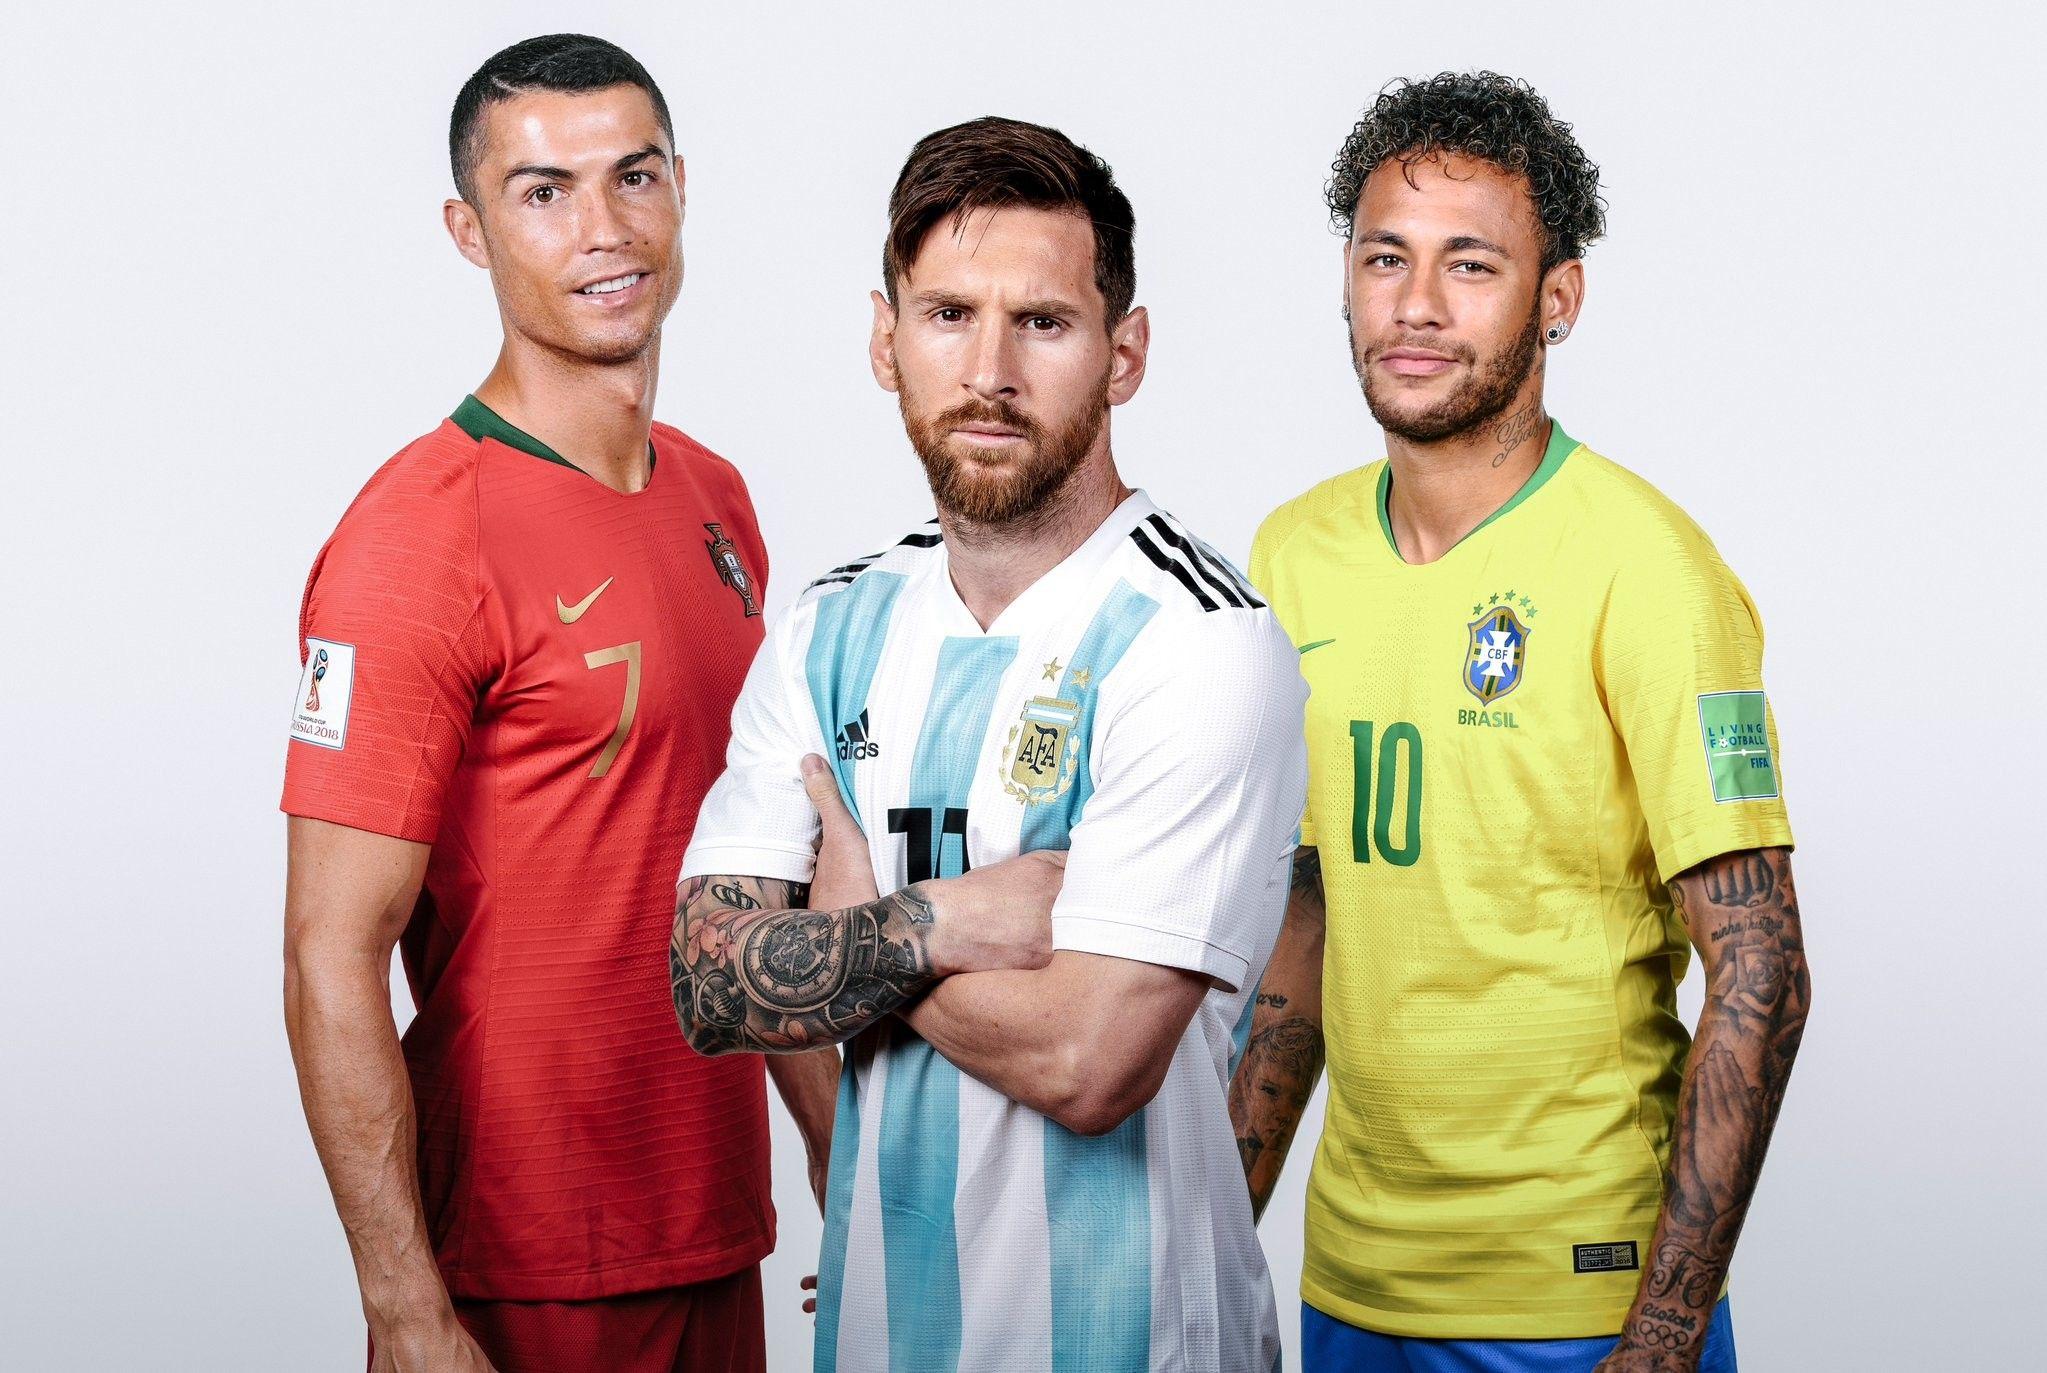 Neymar Ronaldo Messi Messi And Neymar Cristiano Ronaldo And Messi Lionel Messi